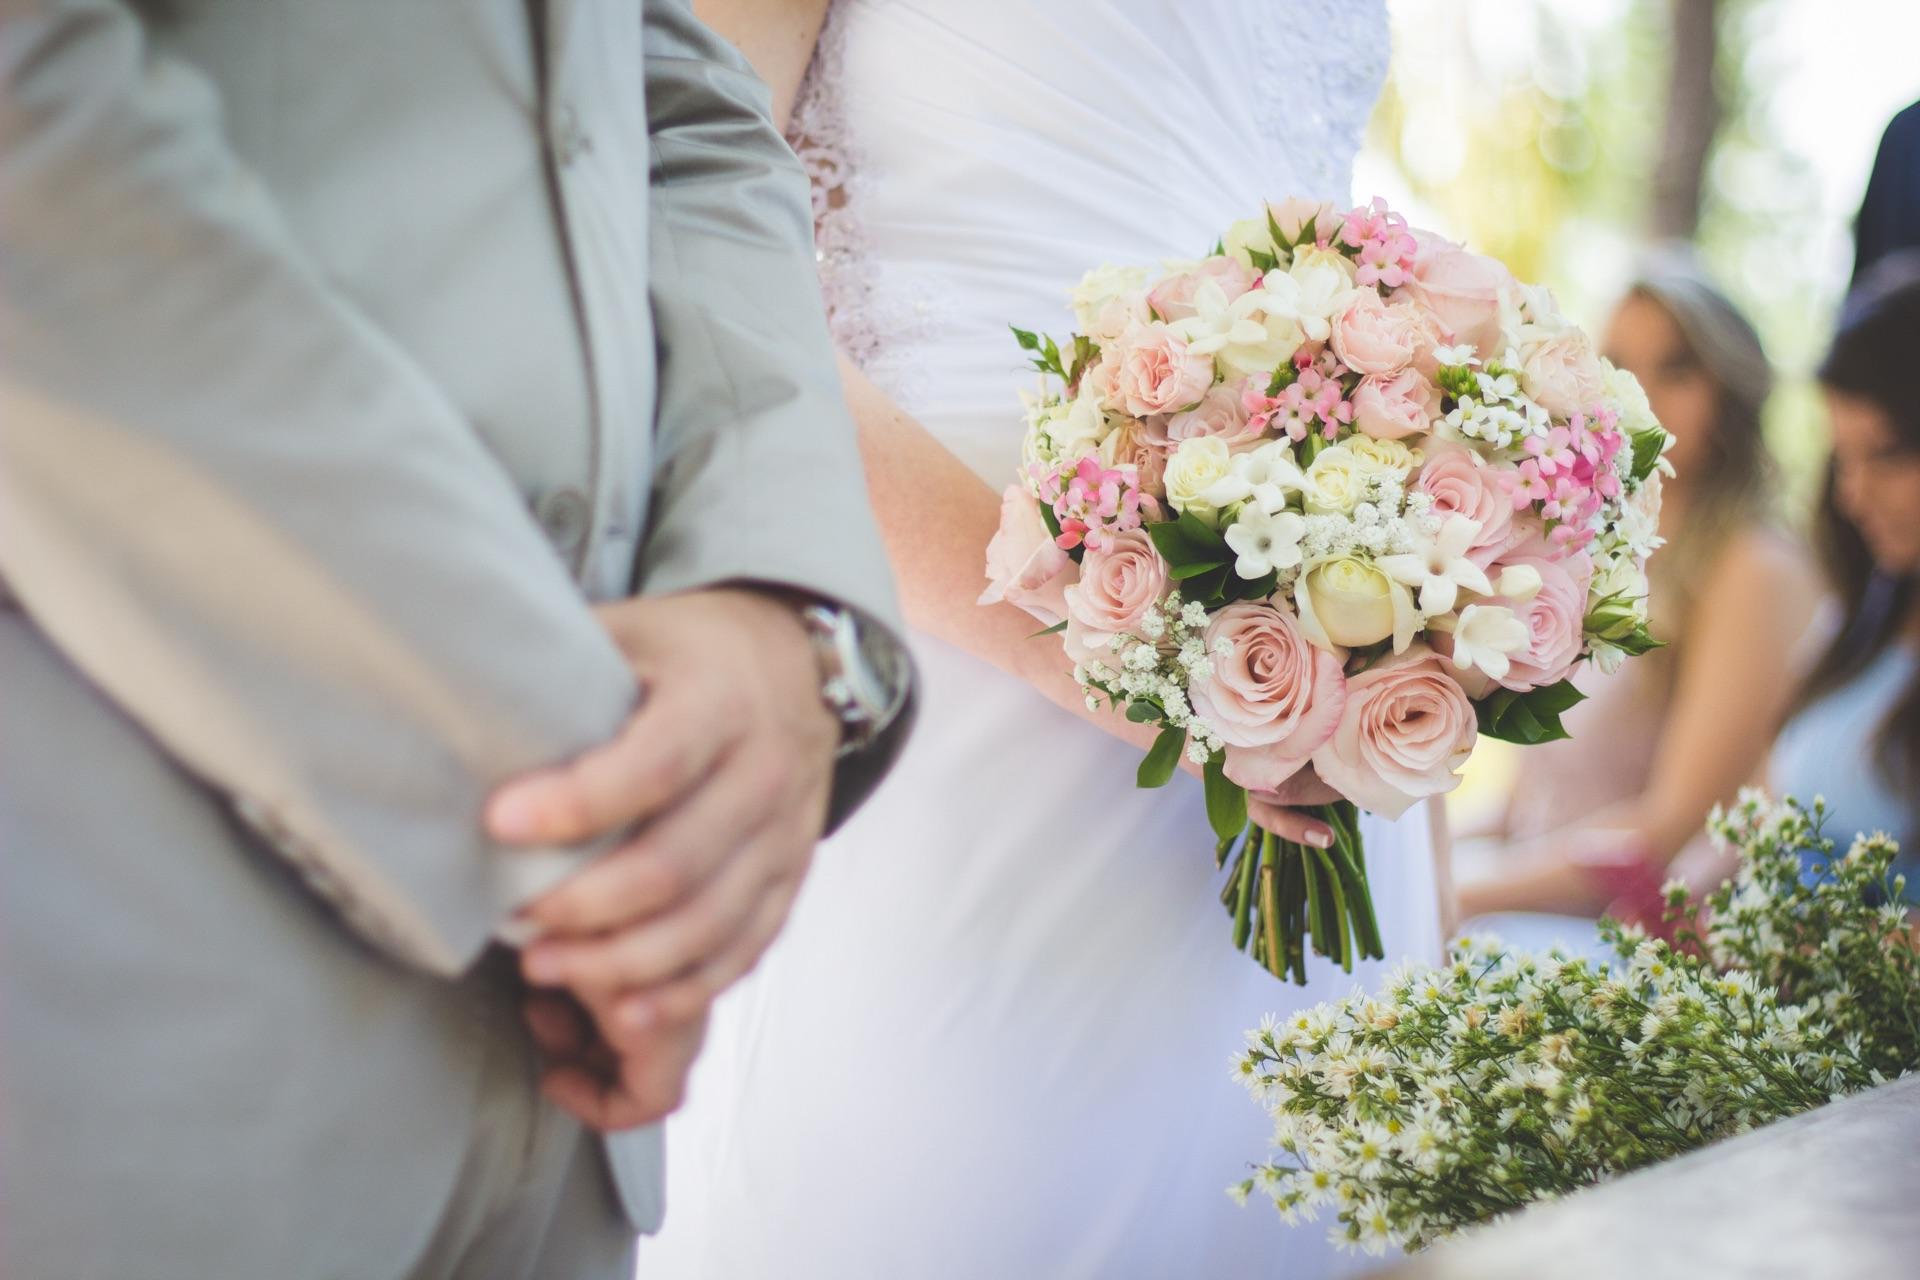 Outdoor Wedding Venue | Bolin Grove Farms Farm